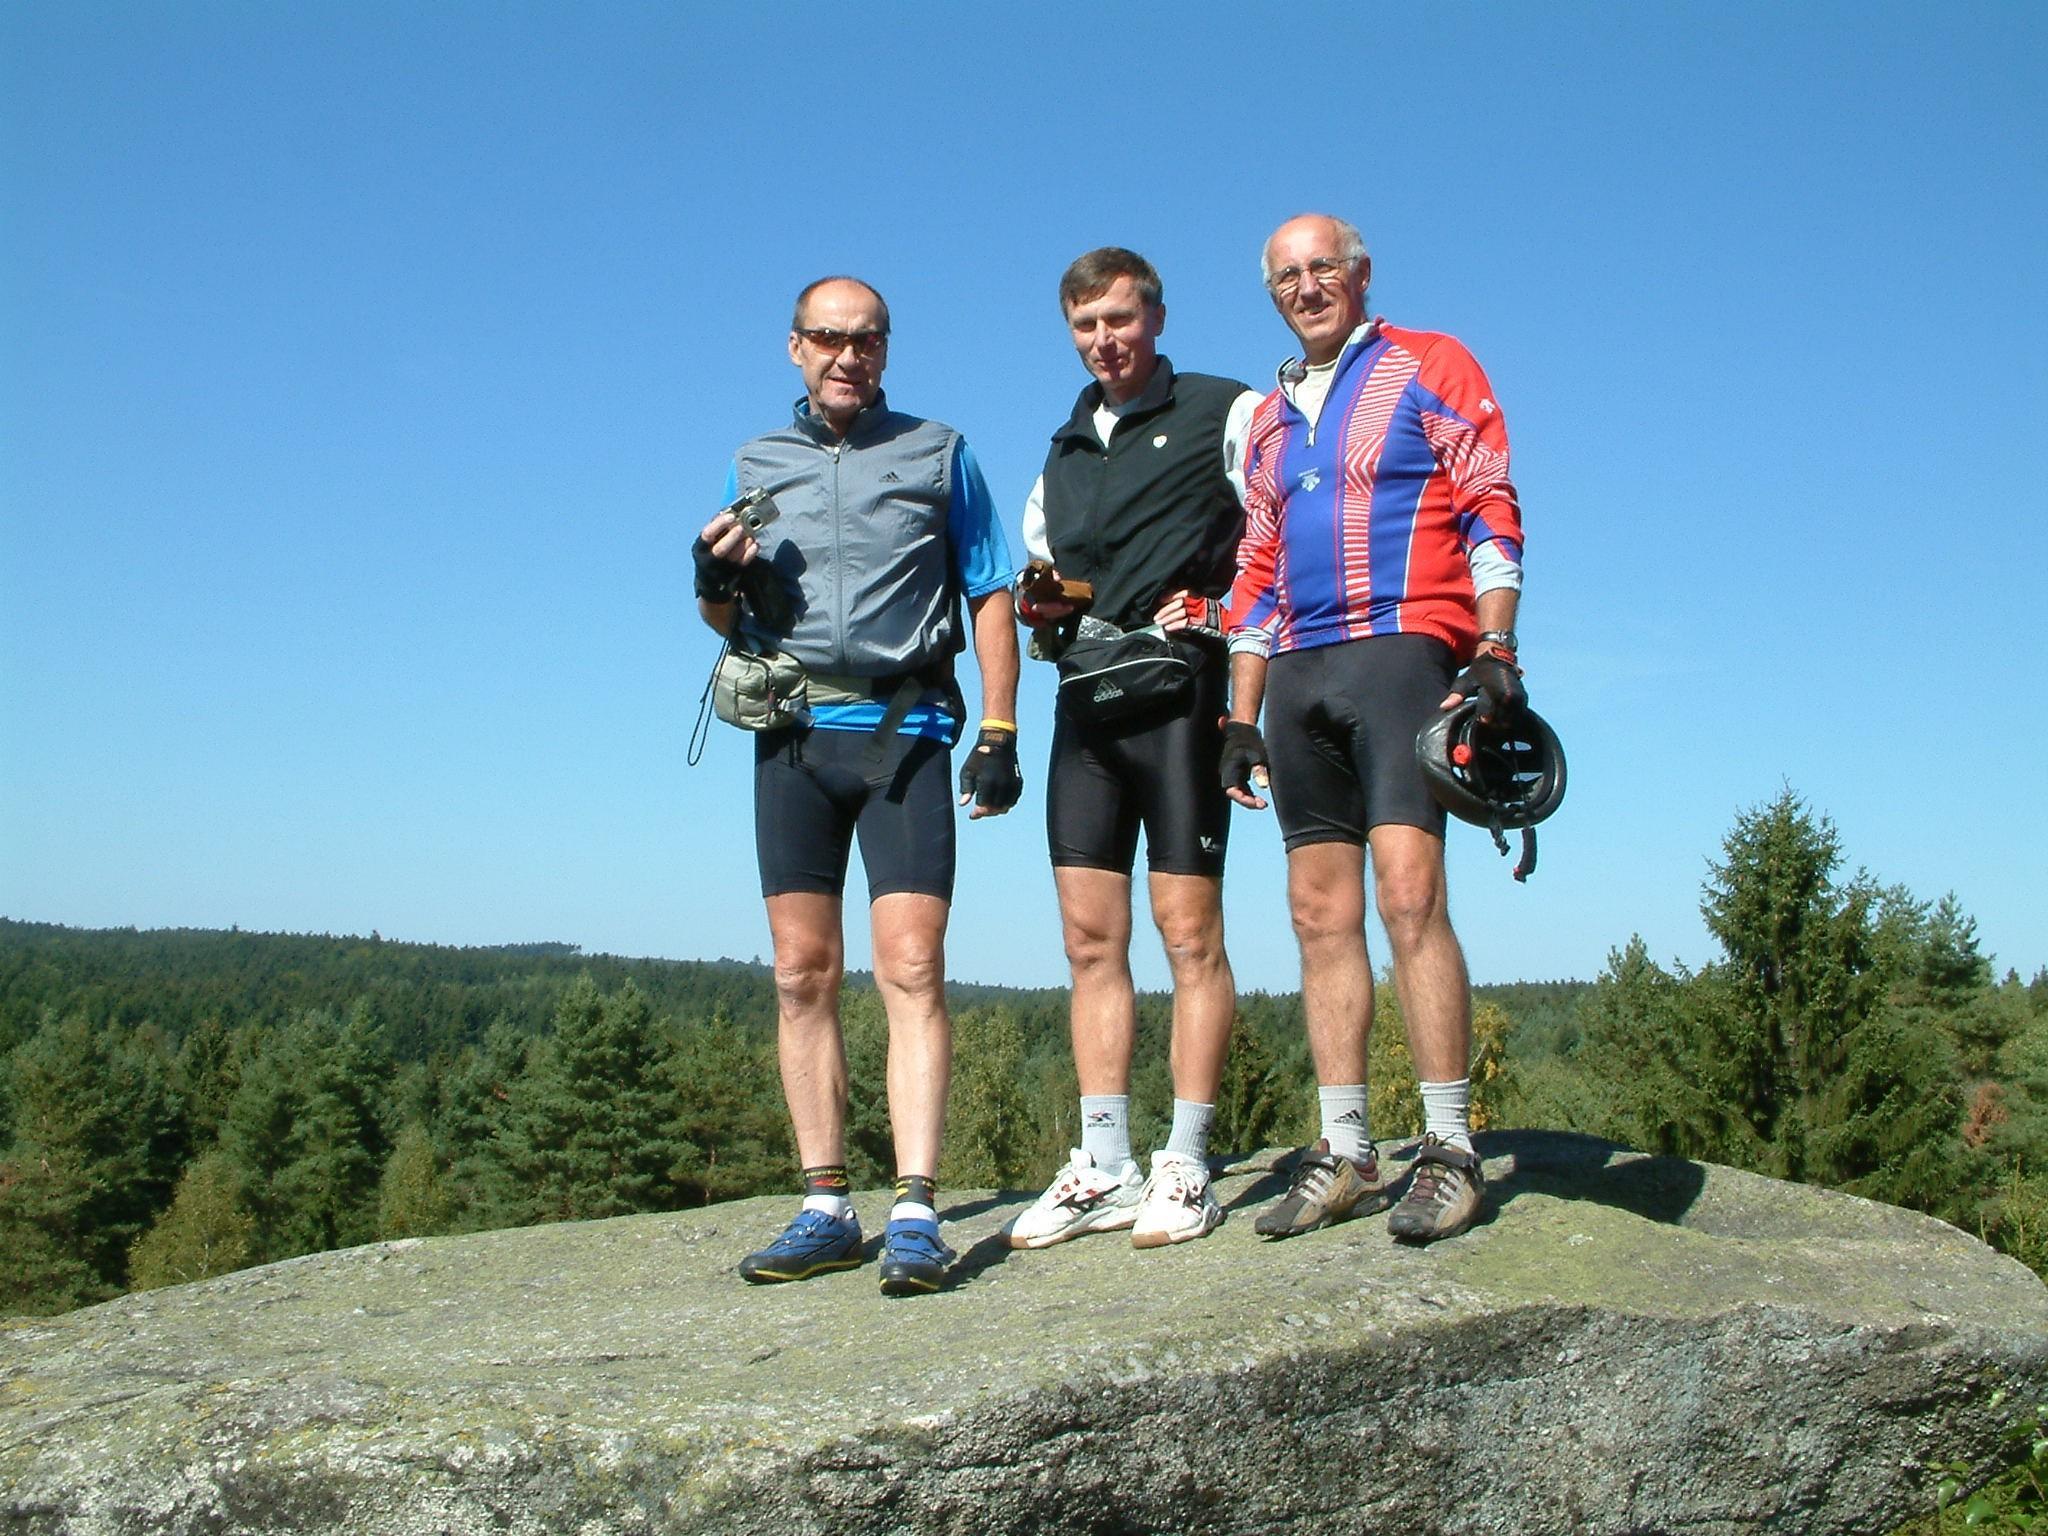 Láďa miloval cyklistiku v okolí sportovního táboru UK na Albeři. Snímek je z Hadího vrchu  z roku 2004.